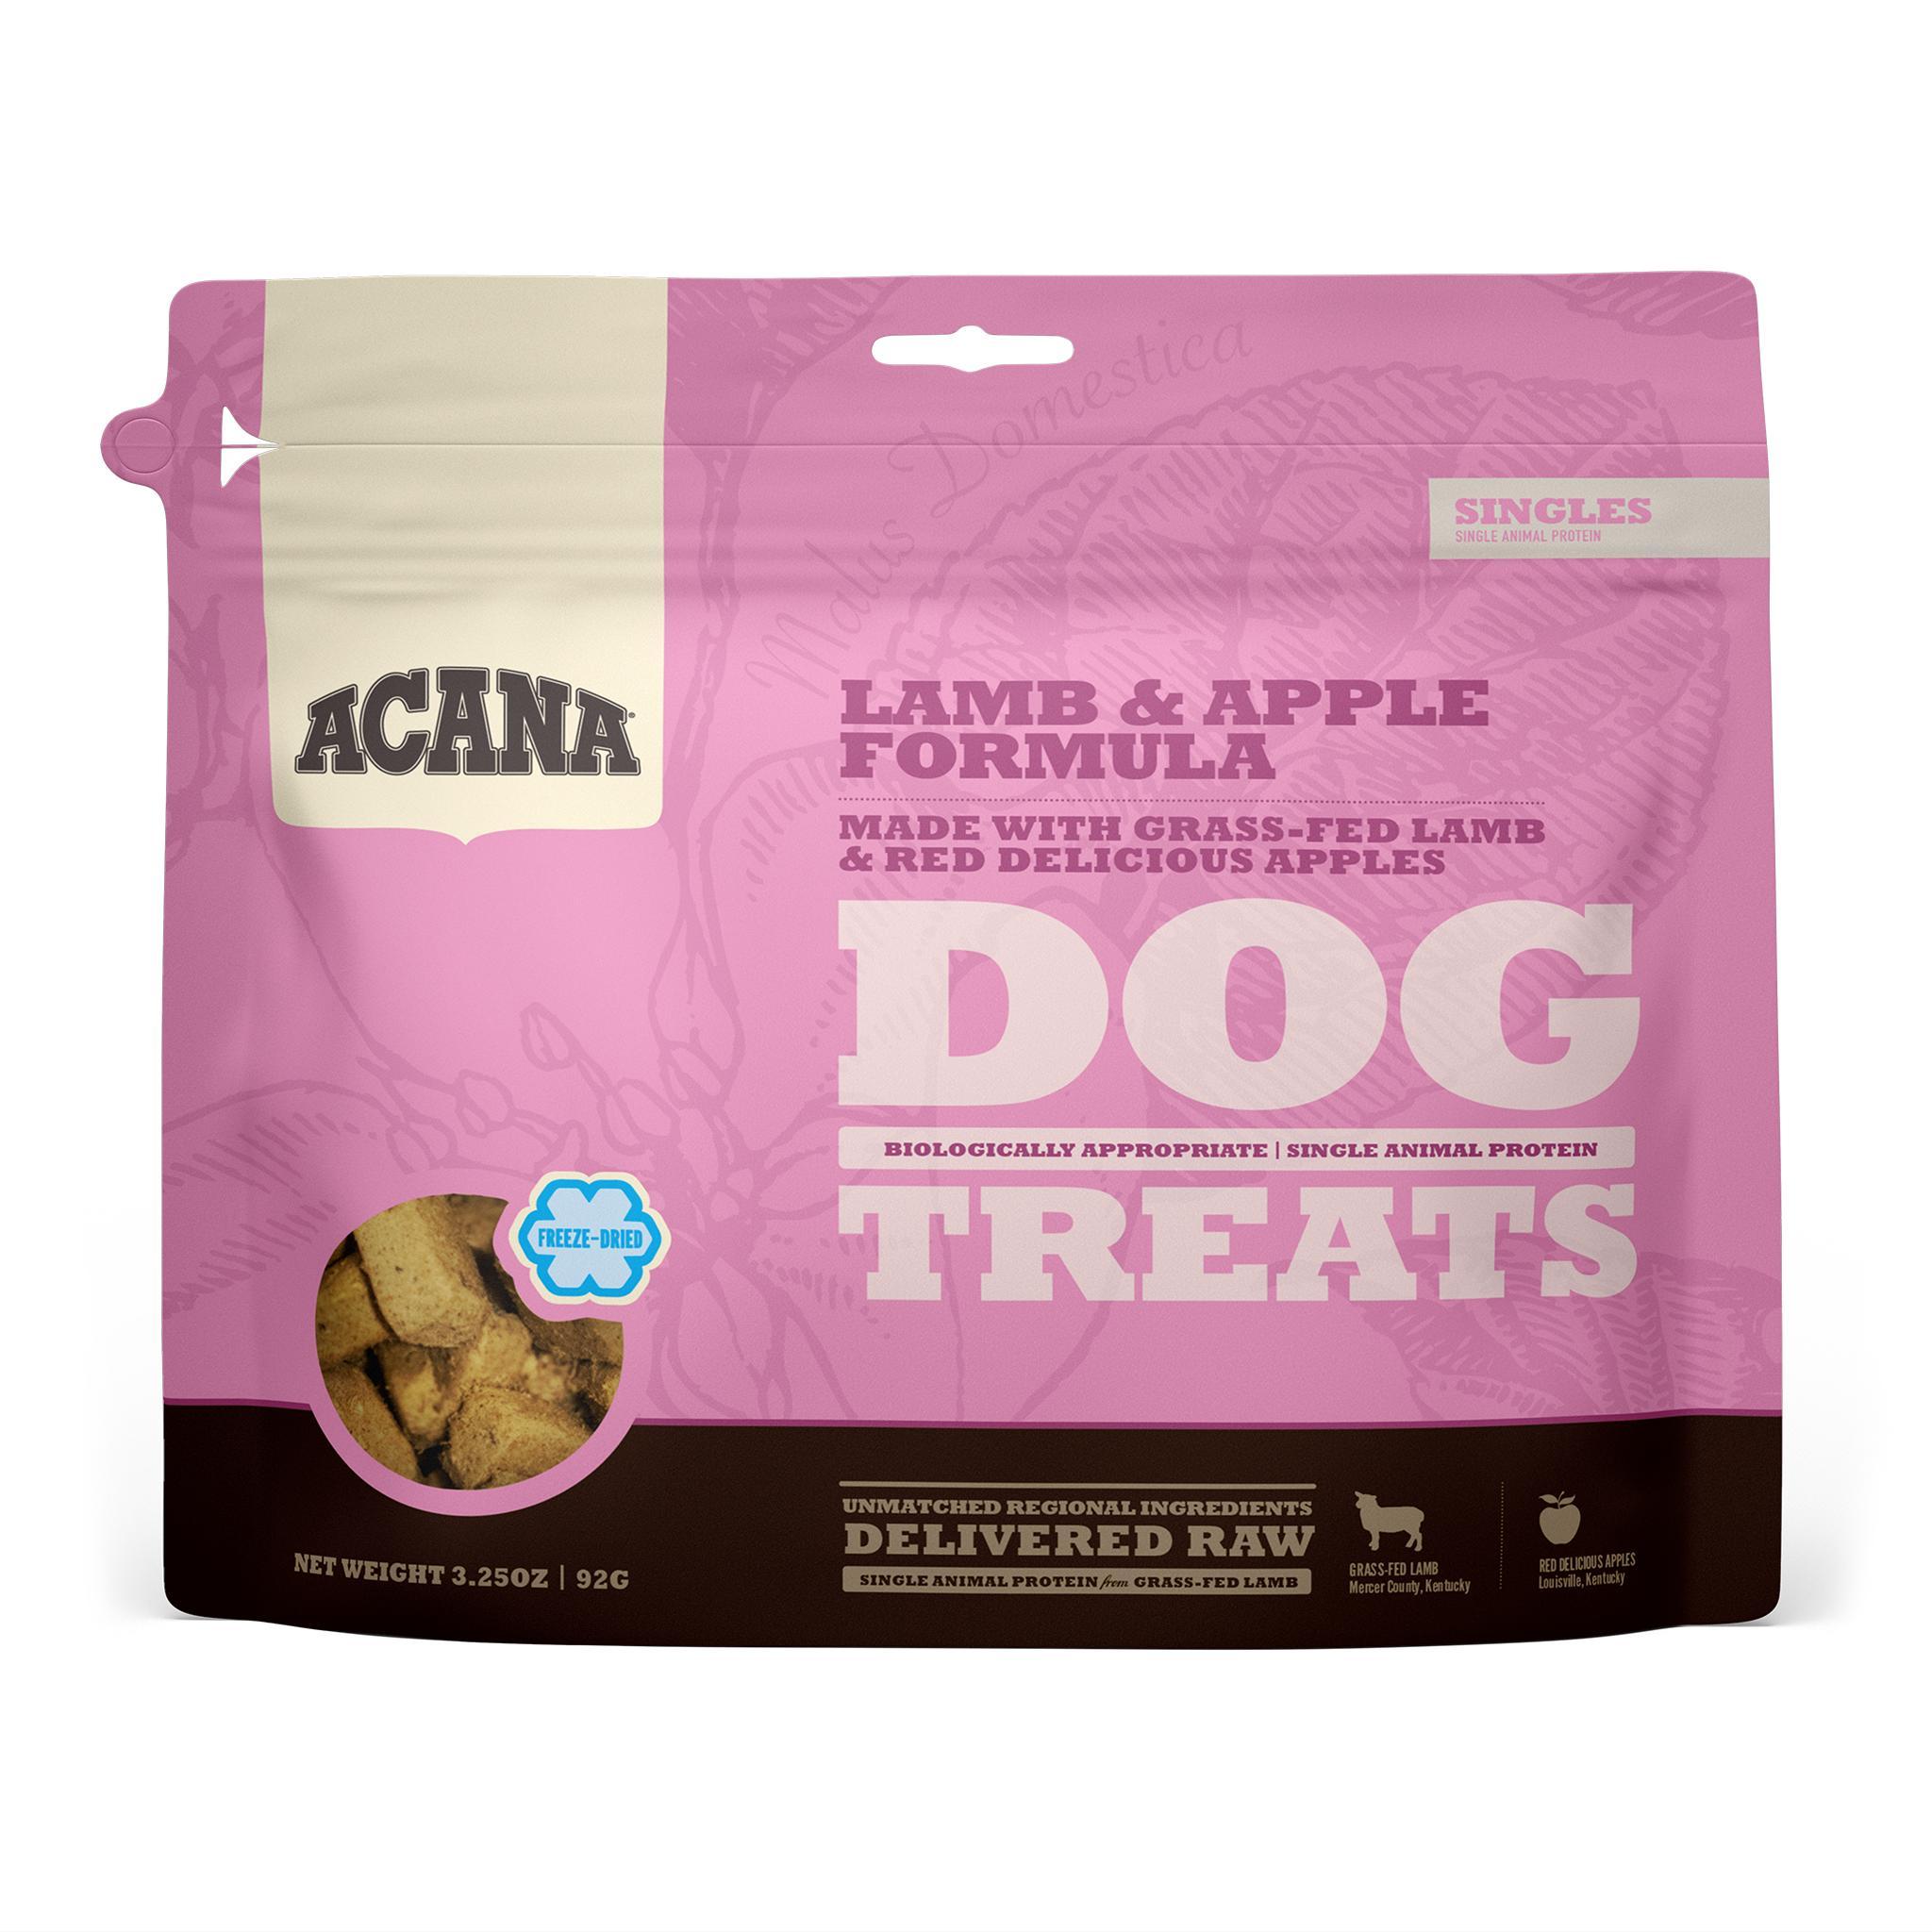 ACANA Singles Lamb & Apple Grain-Free Freeze-Dried Dog Treats, 3.25-oz